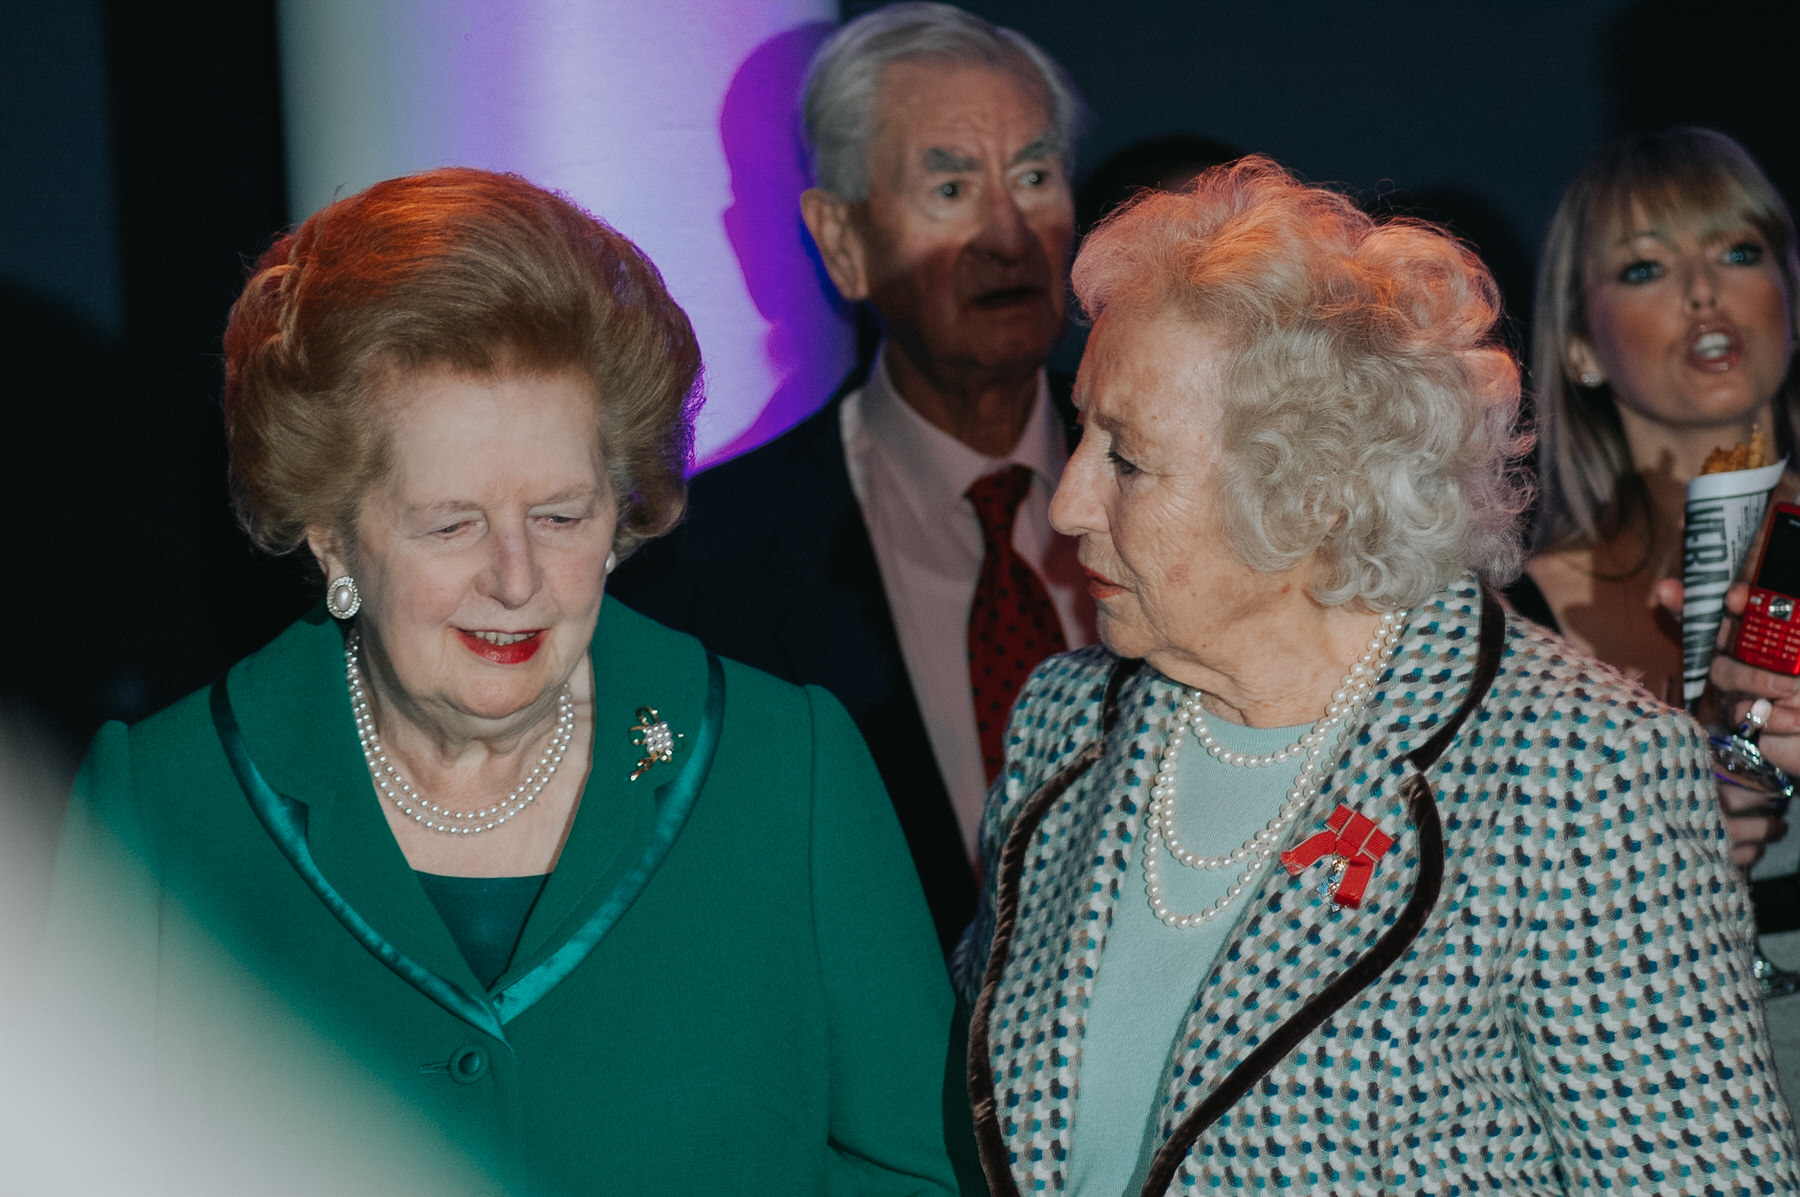 2-Dame Vera Lynn 90th birthday Imperial war Museum Margaret Thatcher.jpg